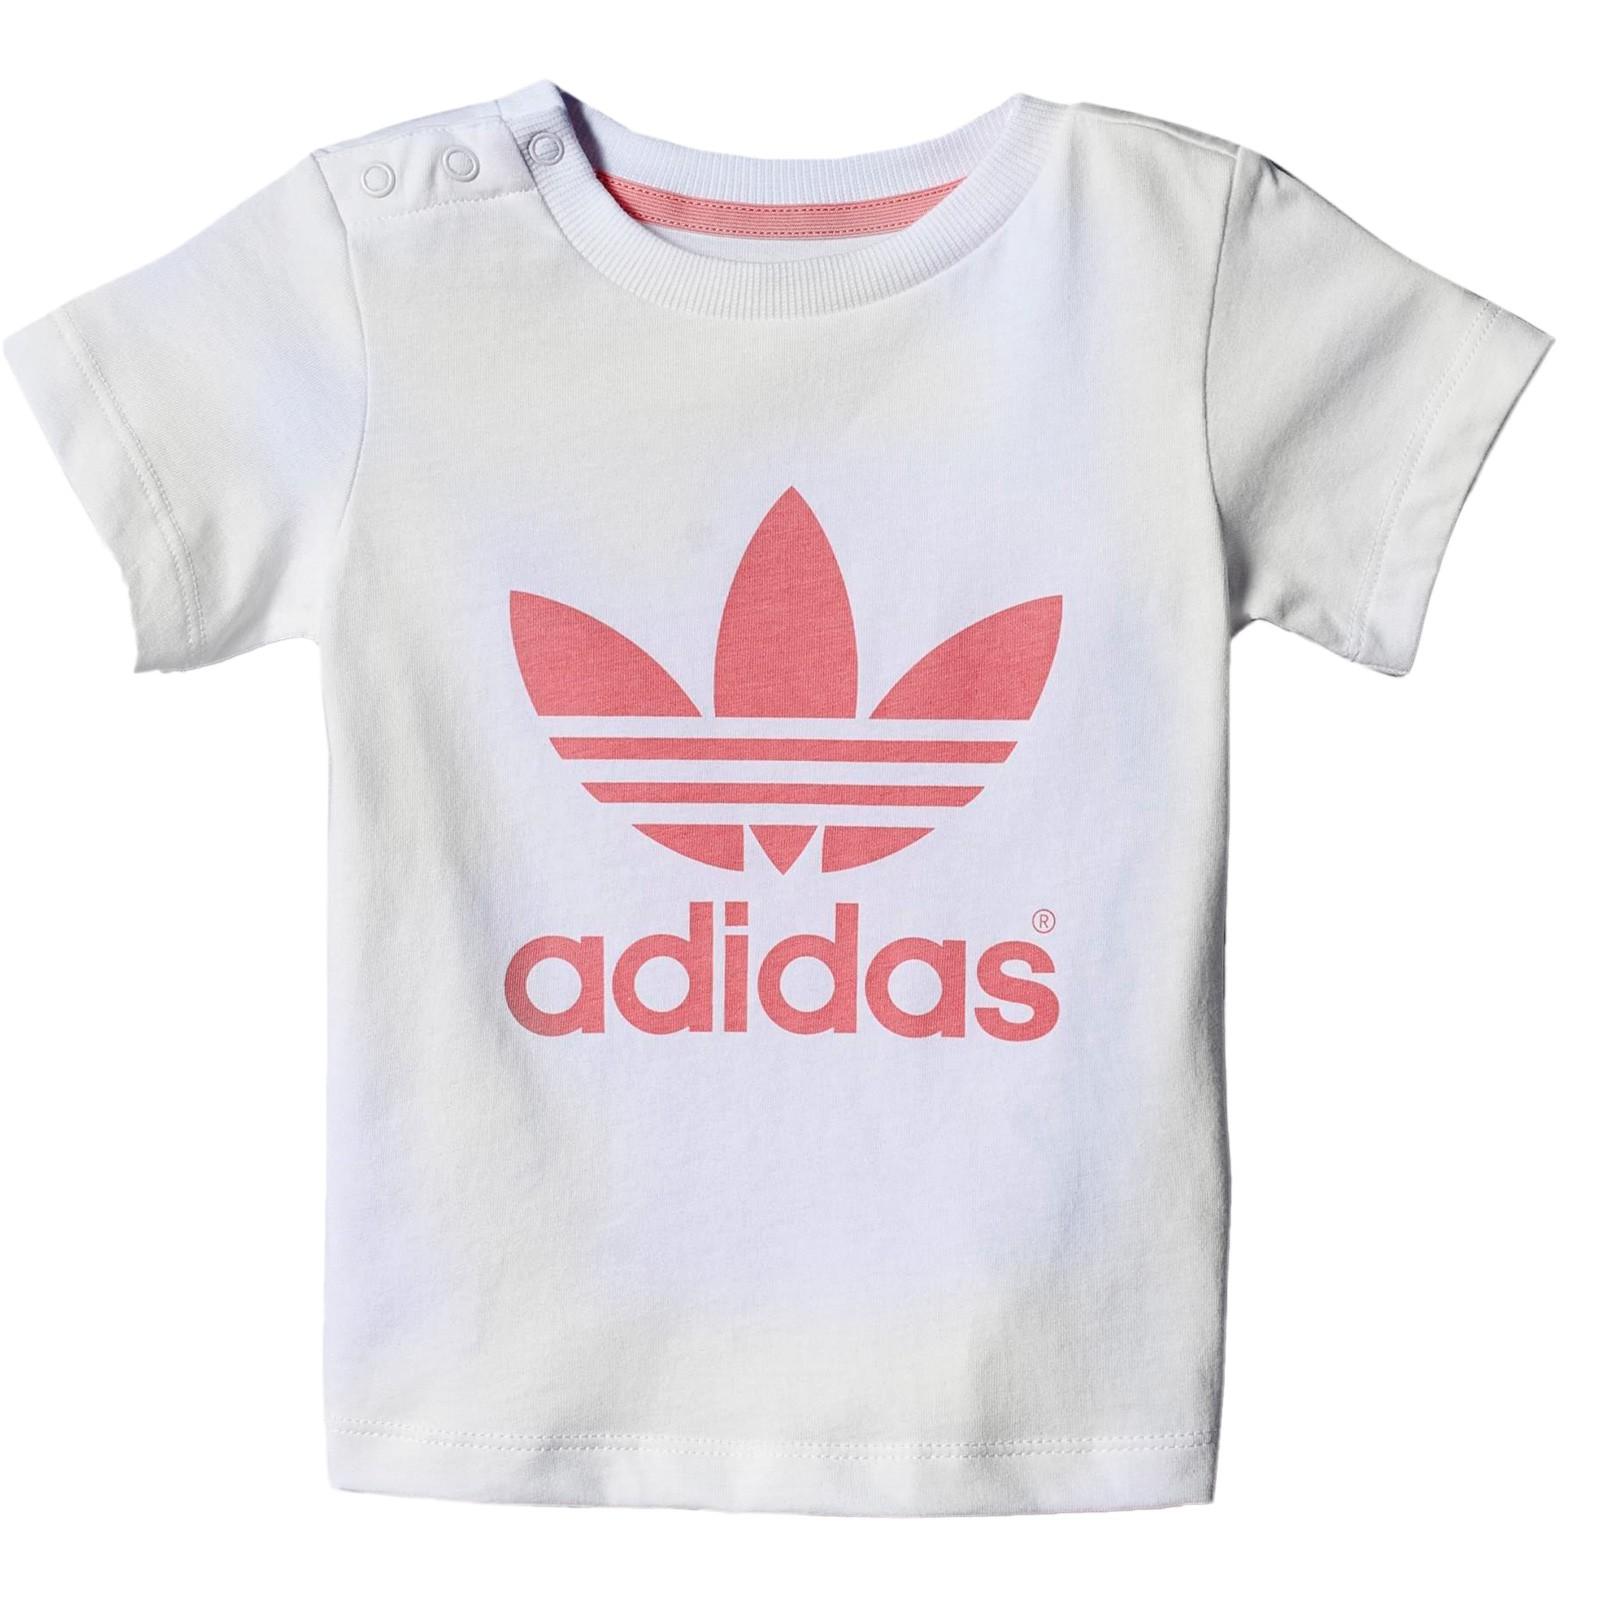 Pink T Buy Adidas Shirt Discounted Kids gt; Off71 xAxFIq